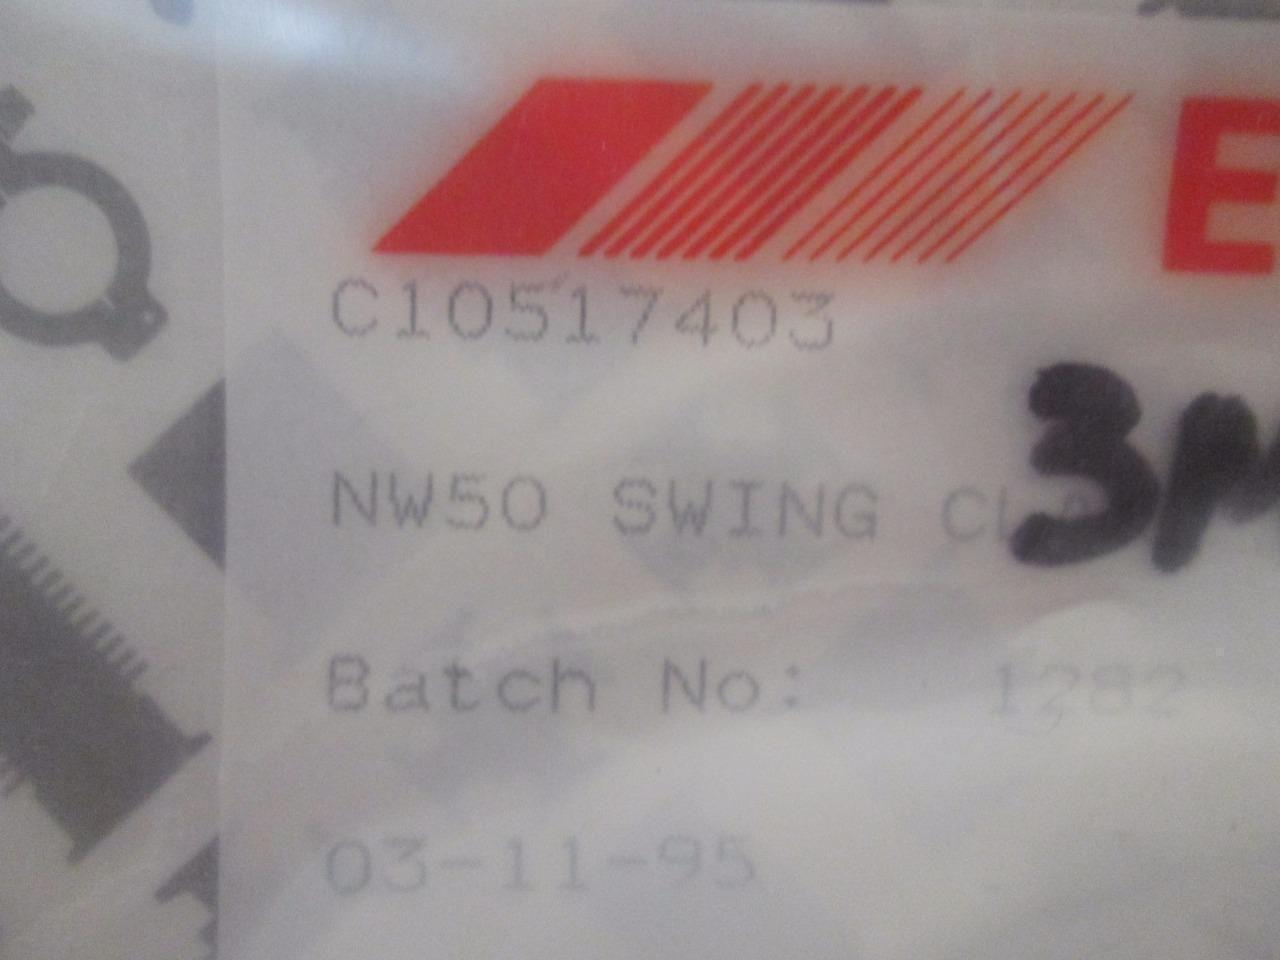 Edwards C10517403 NW50 Aluminum Swing Clamp - Lot of 7